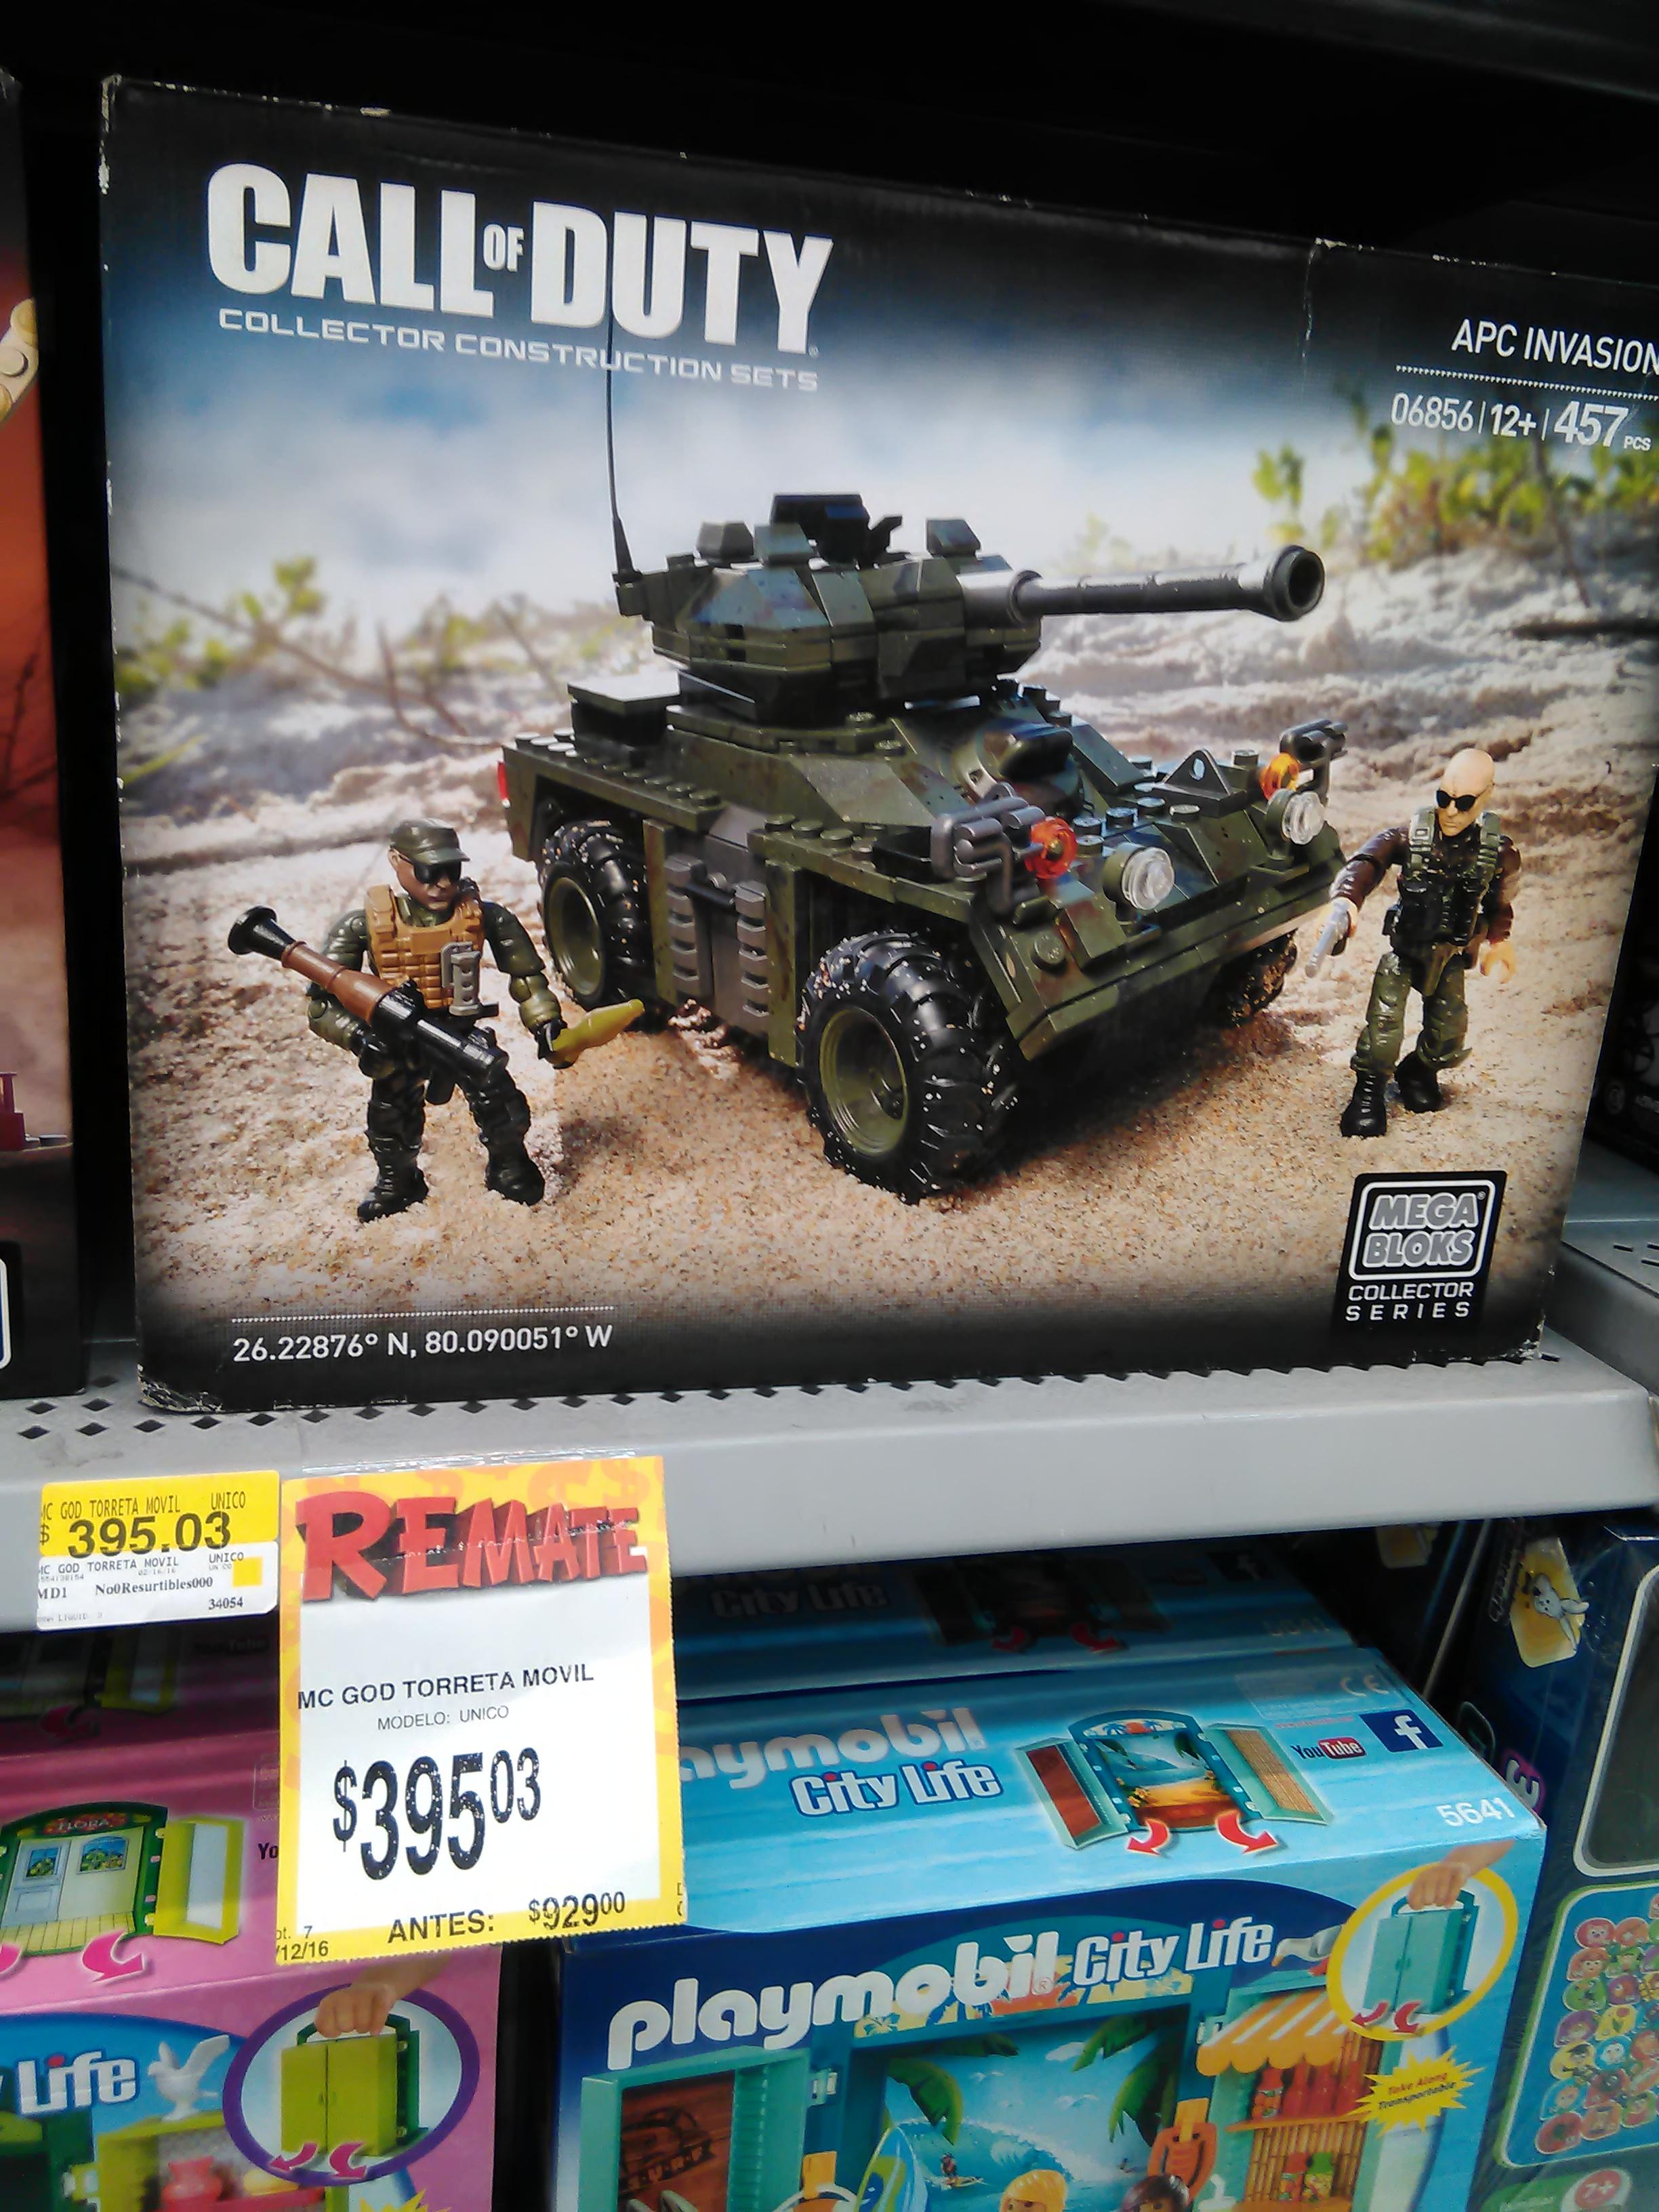 Bodega Aurrerá 1o de Mayo Naucalpan: Mega Blocks Call of Duty (Torreta movil) de $929 a $395